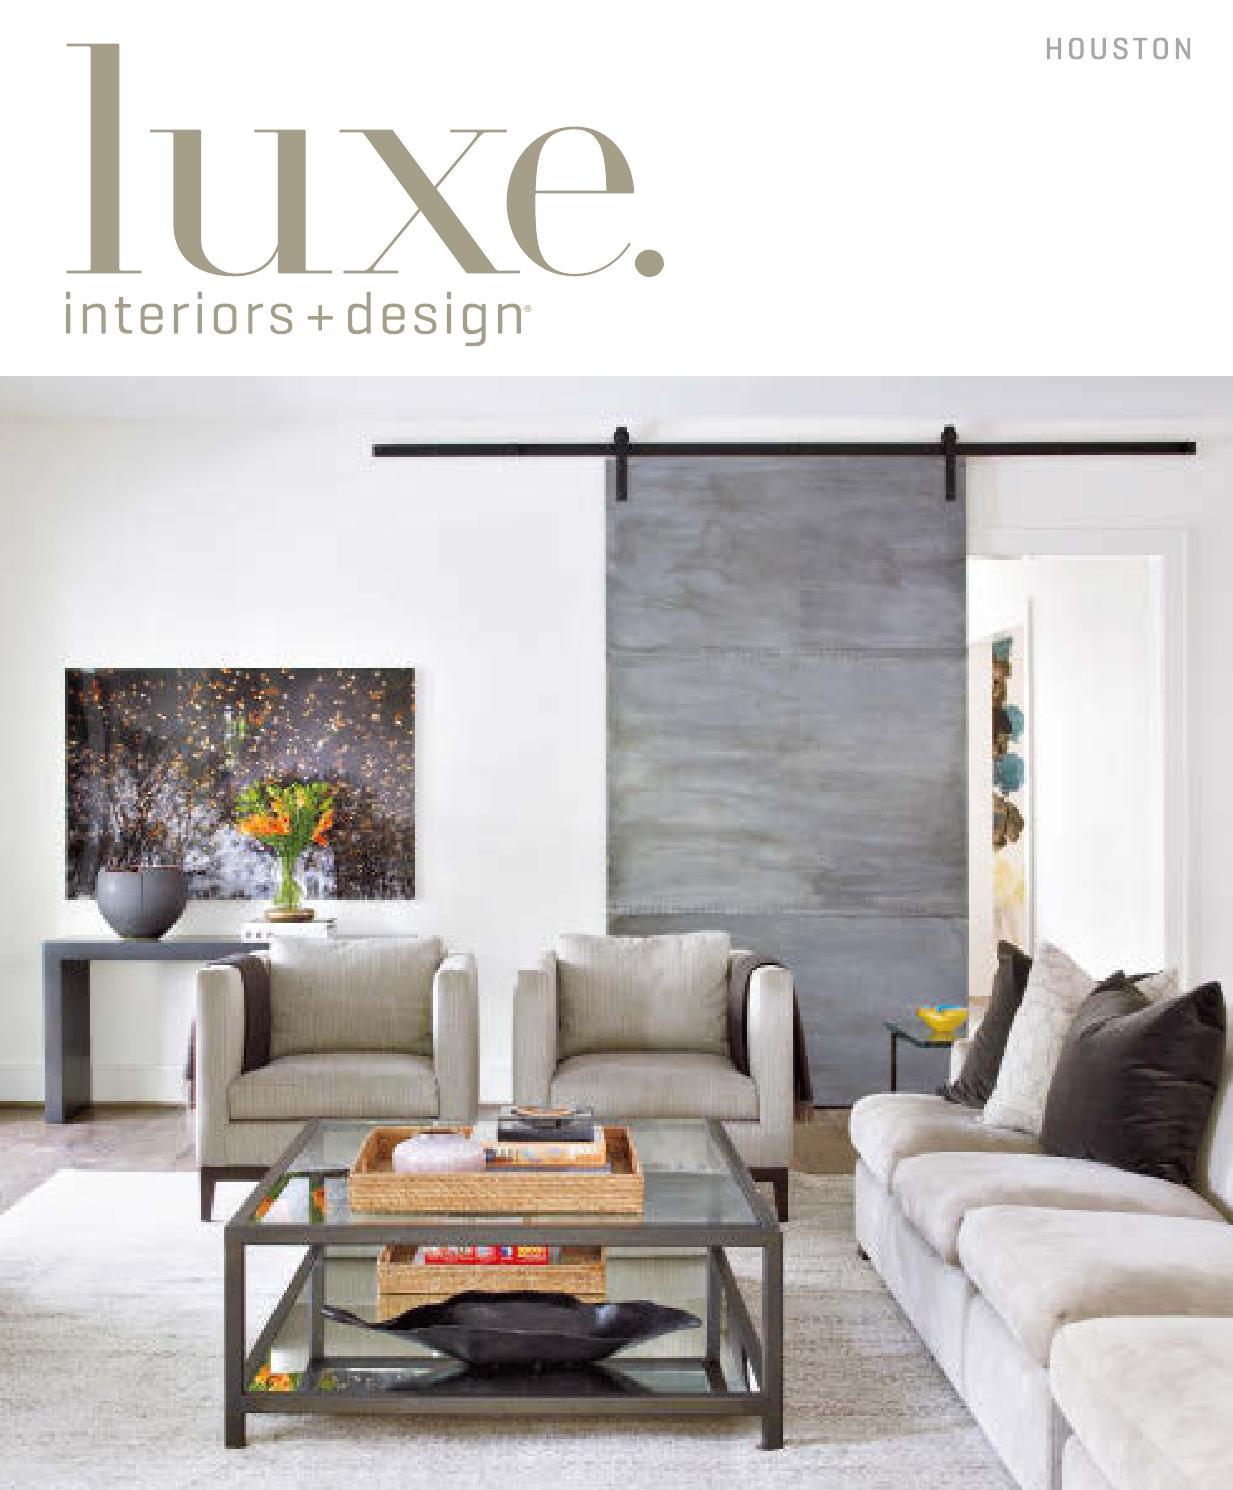 Luxe Magazine September 2015 Houston by SANDOW® - issuu